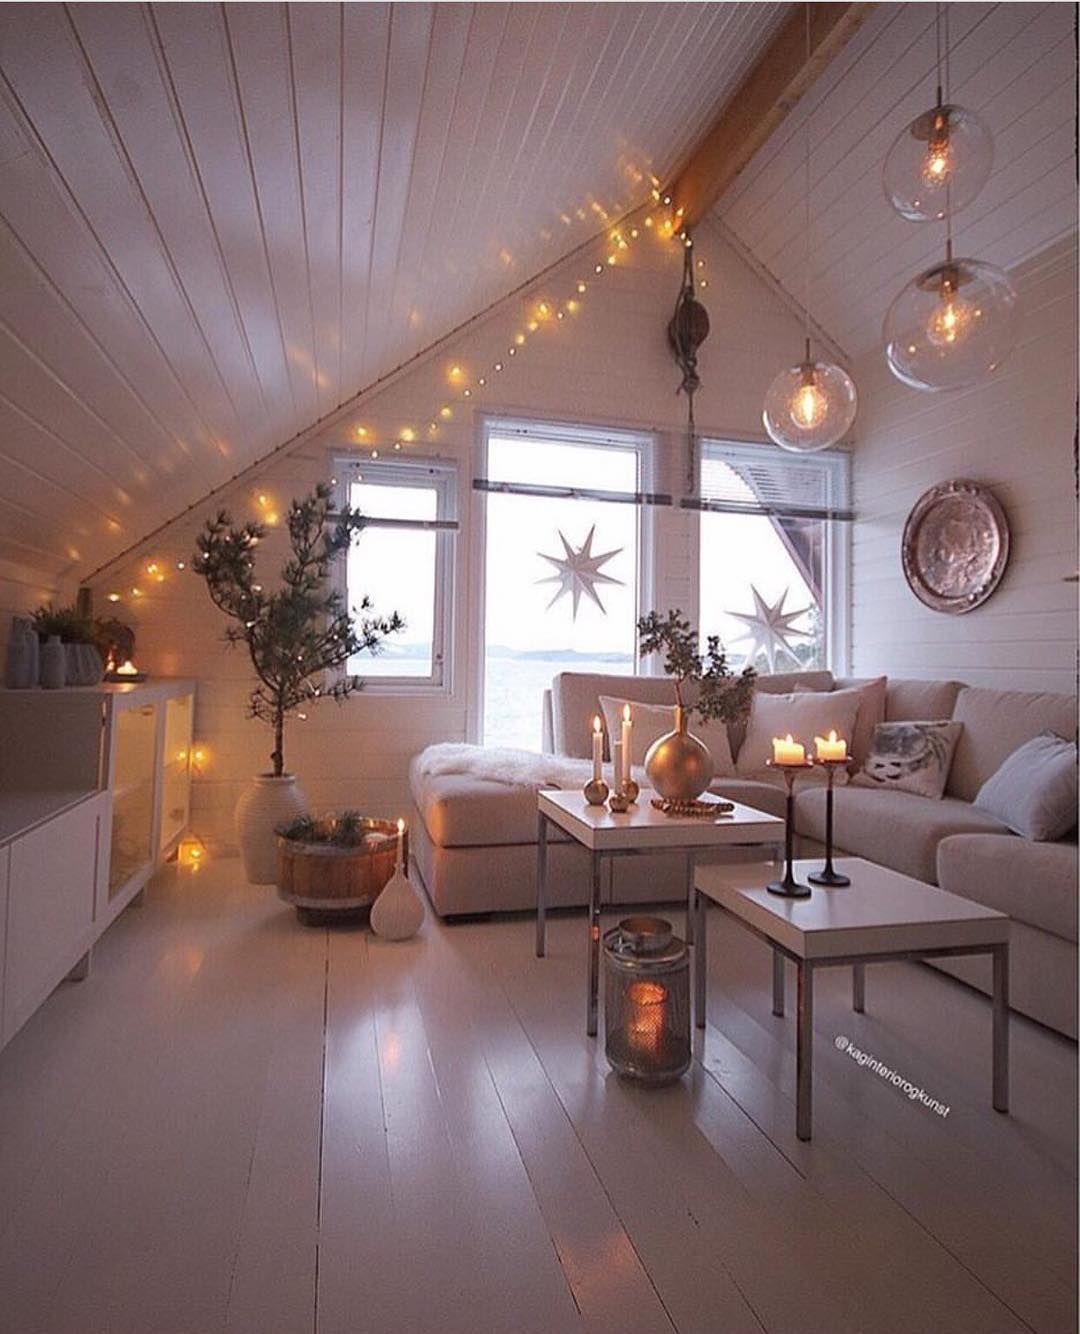 1 978 Mentions J Aime 28 Commentaires Fashiongals Fashiogalsz Sur Instagram Cozy Room Via Fashiongoalsz By Kagin Luxury Living Room Home Home Decor